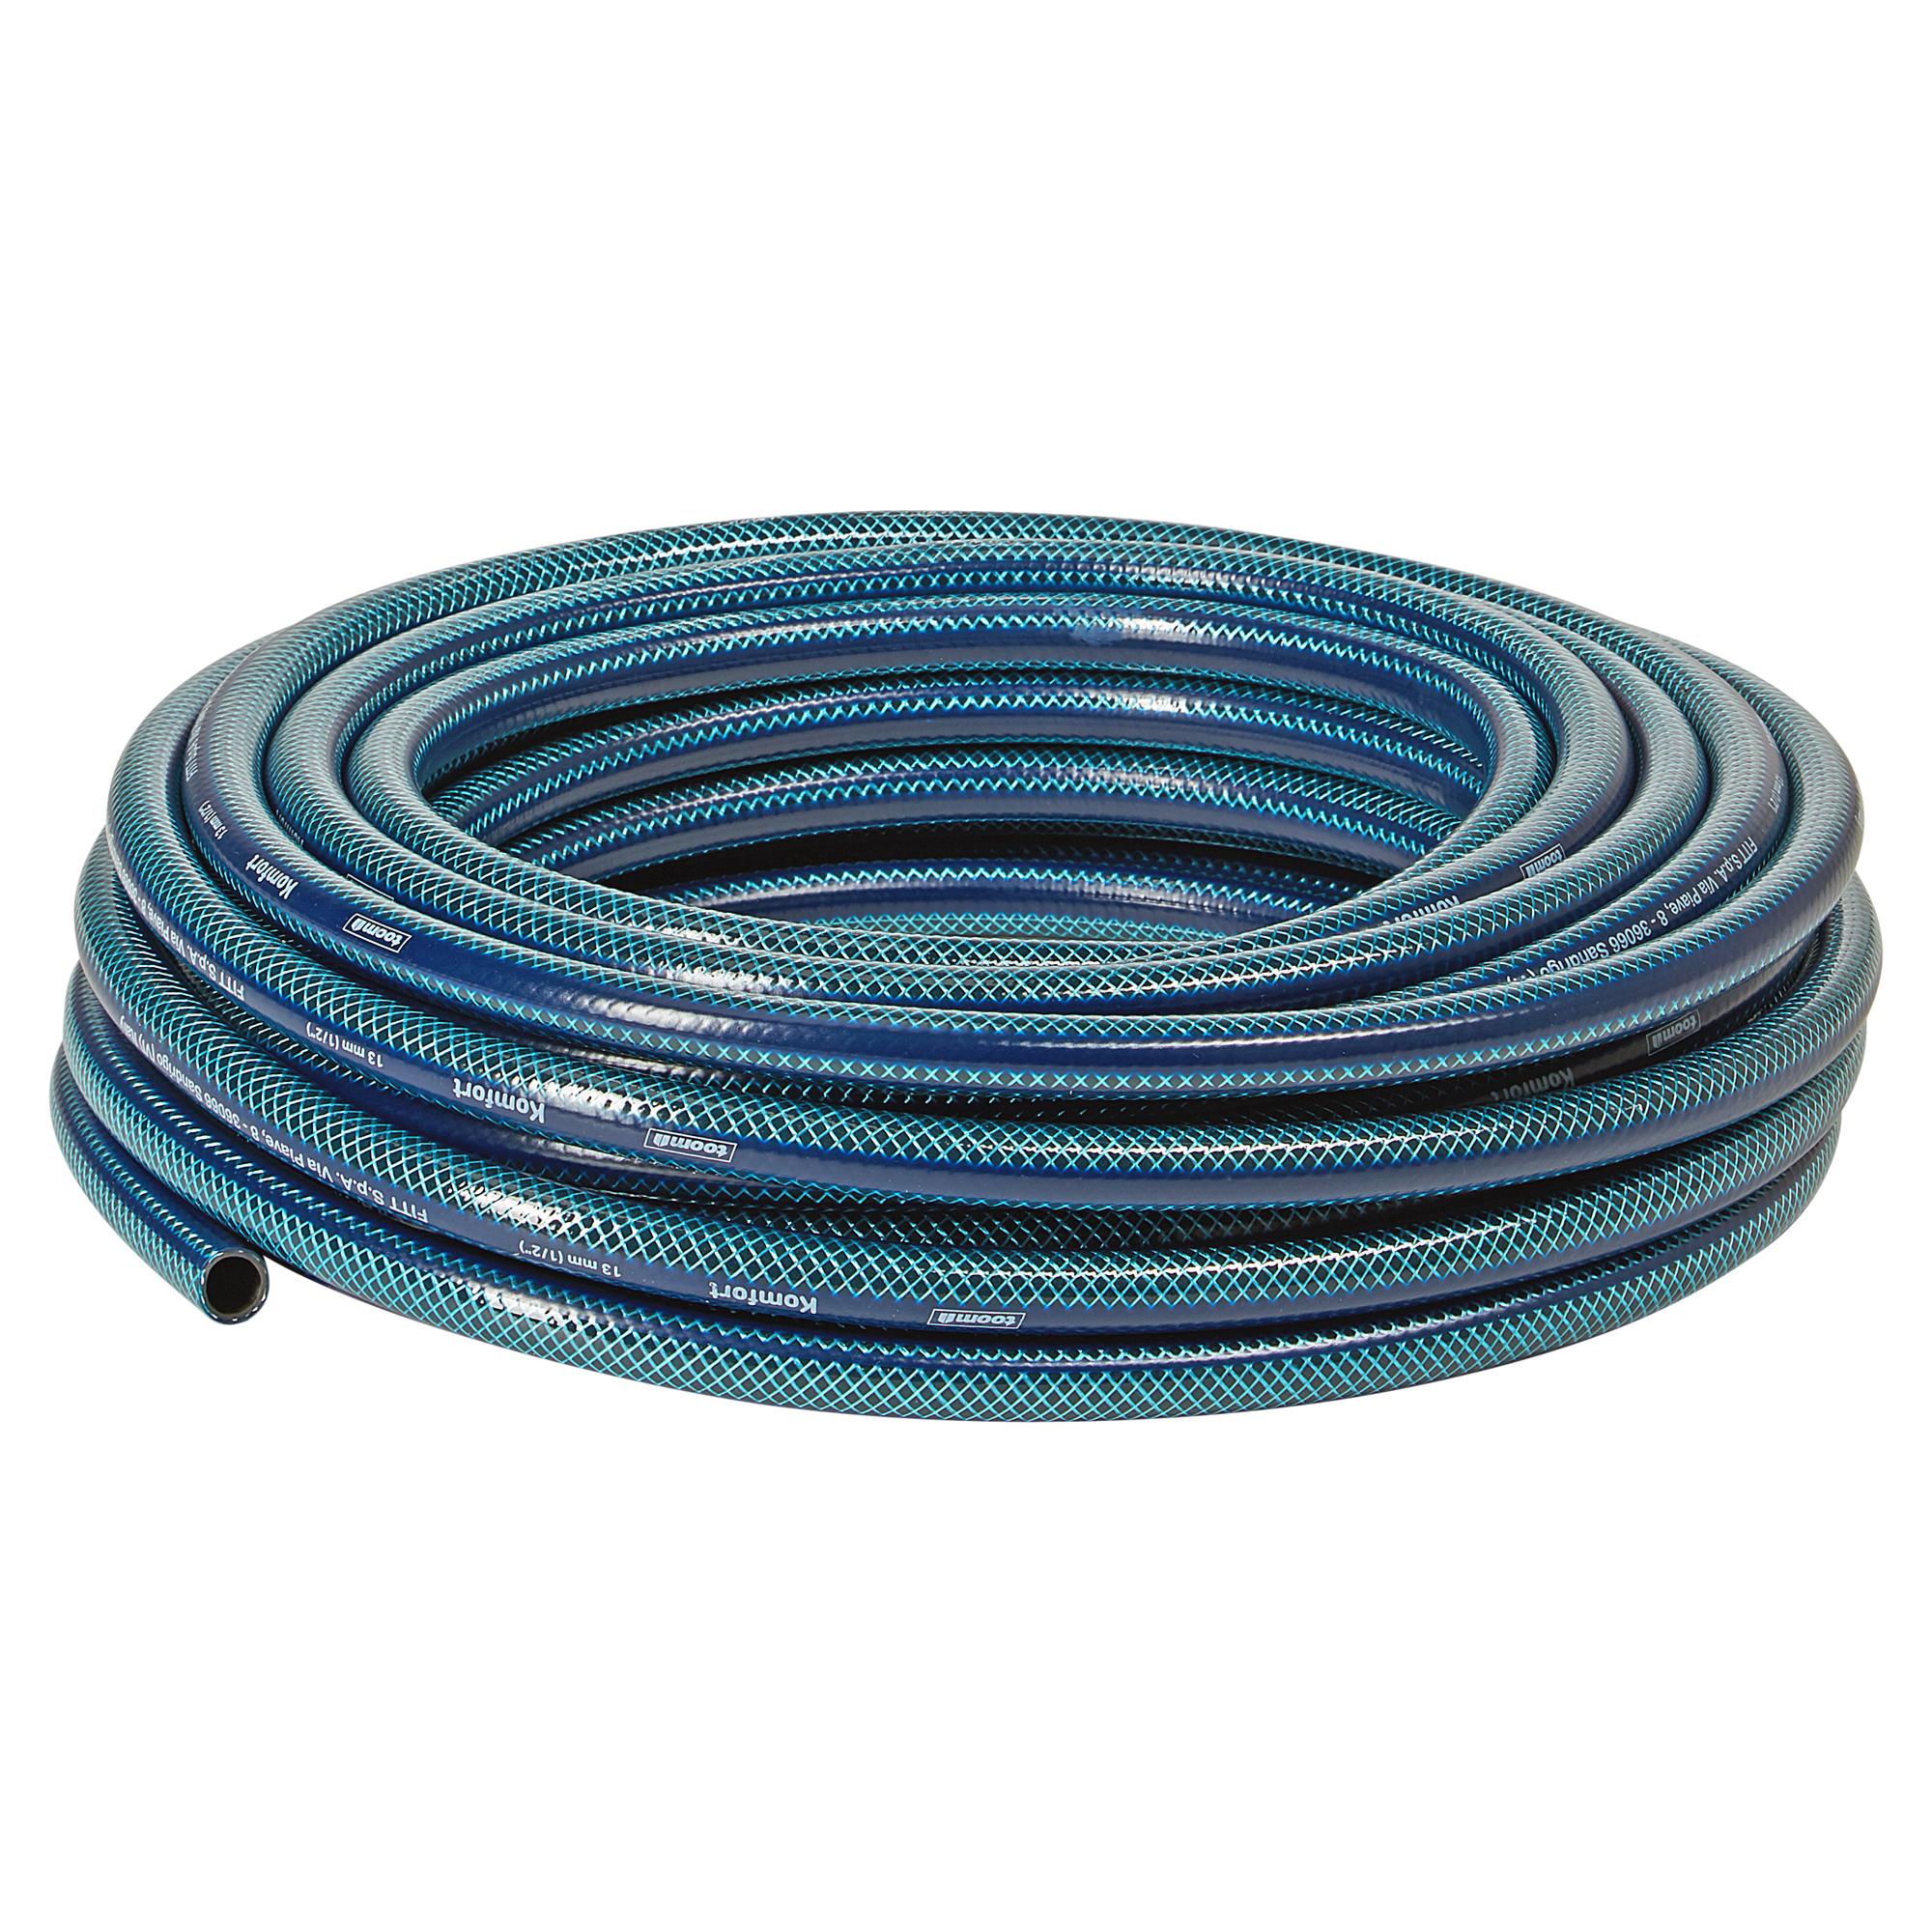 0,8€//m Gartenschlauch flexibel Wasserschlauch 1//2 Zoll Anschlussgarnitur 20m//30m